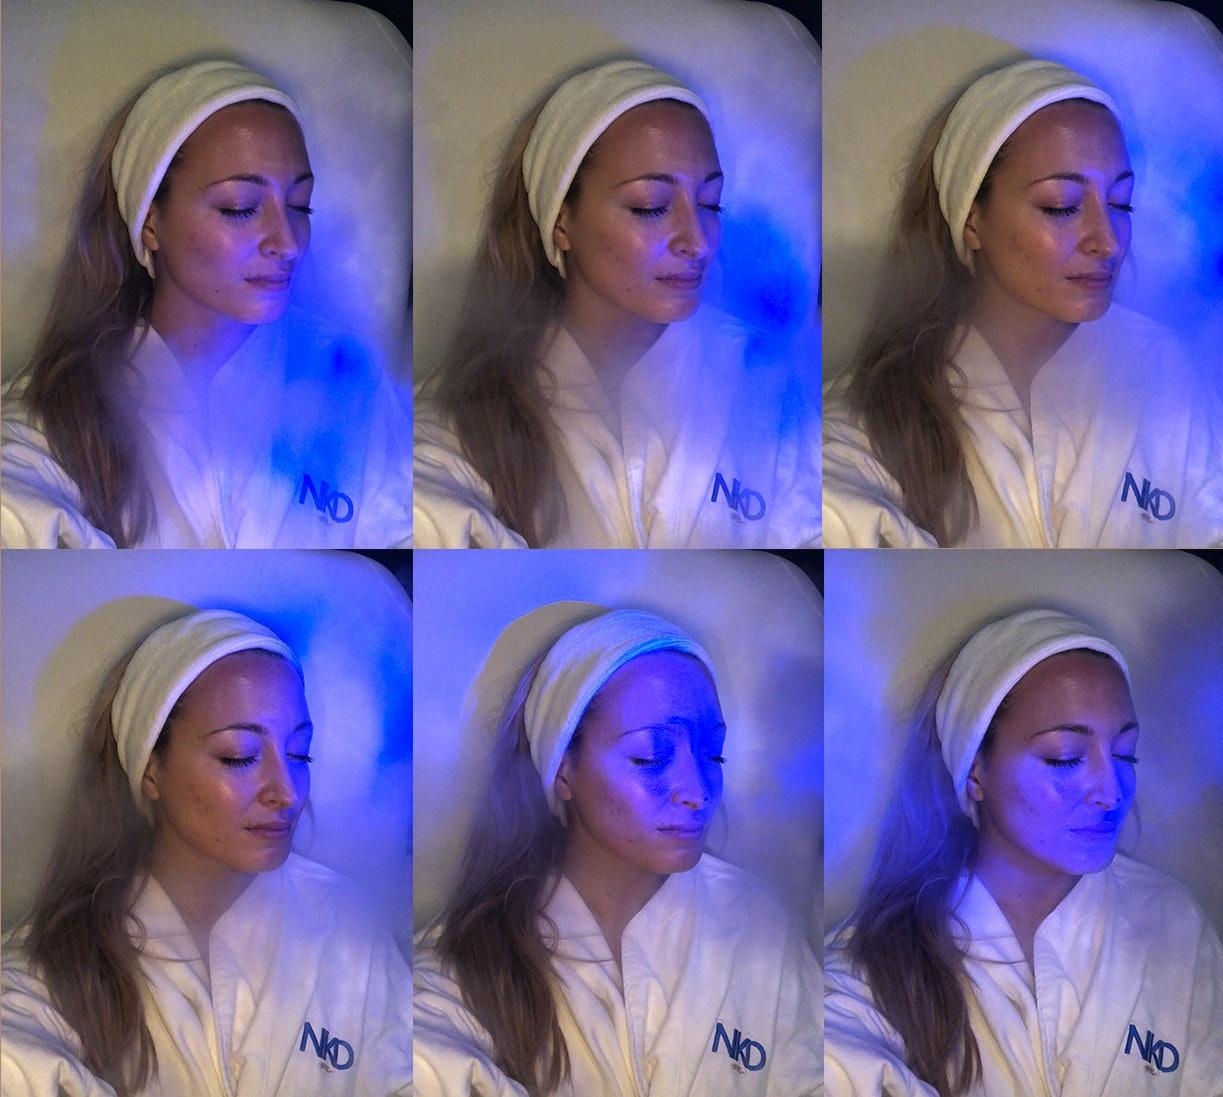 I Tried A Cryofacial Like Kim Kardashian & My Skin Feels